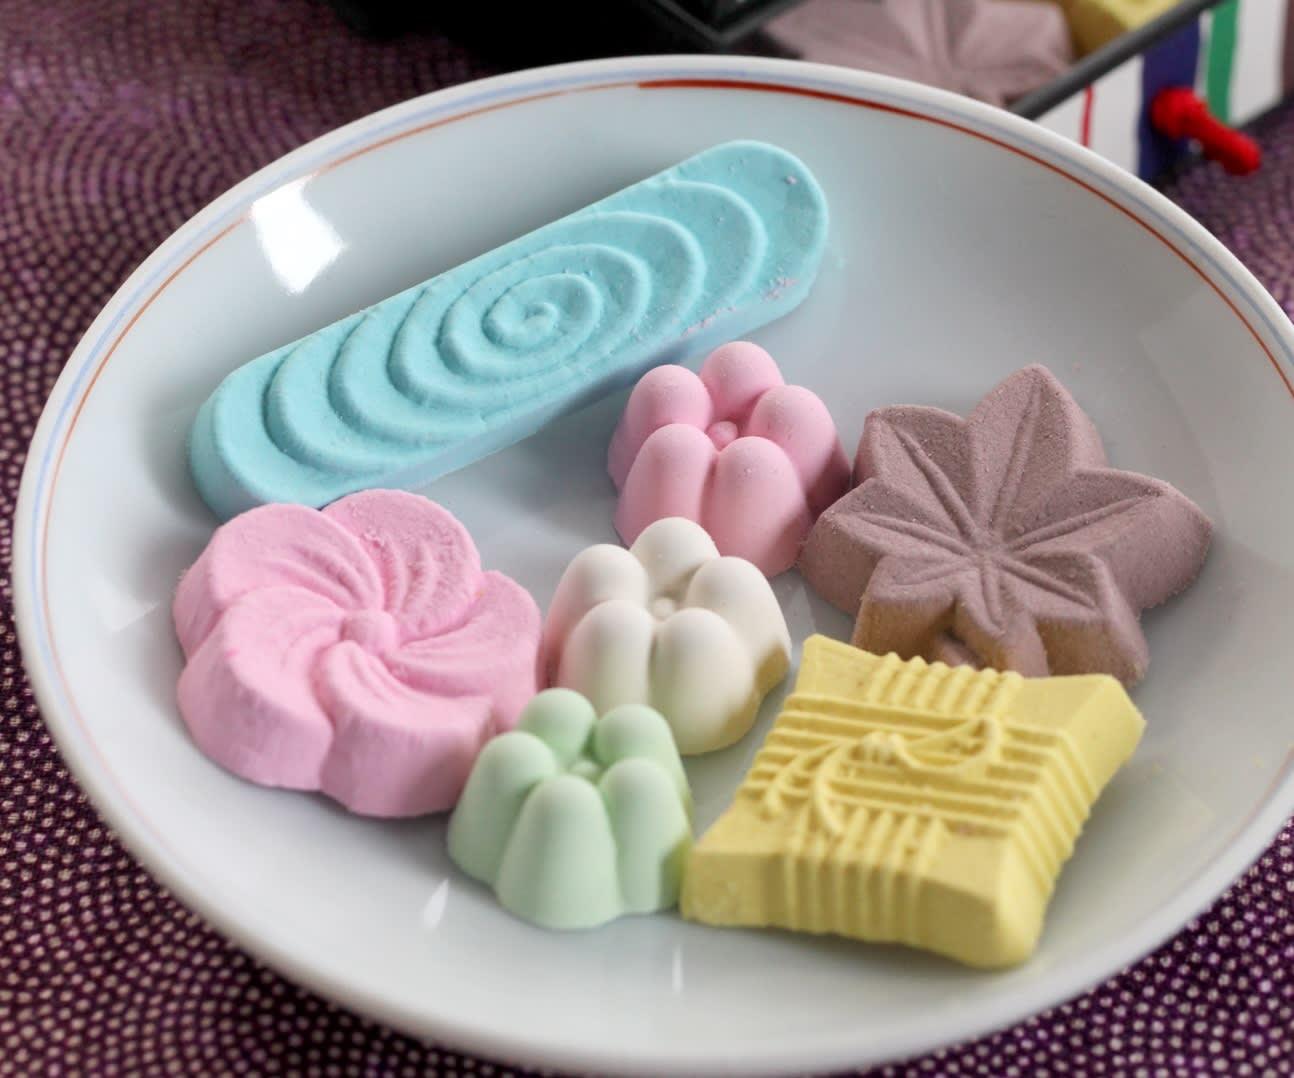 「higashi sweet」の画像検索結果